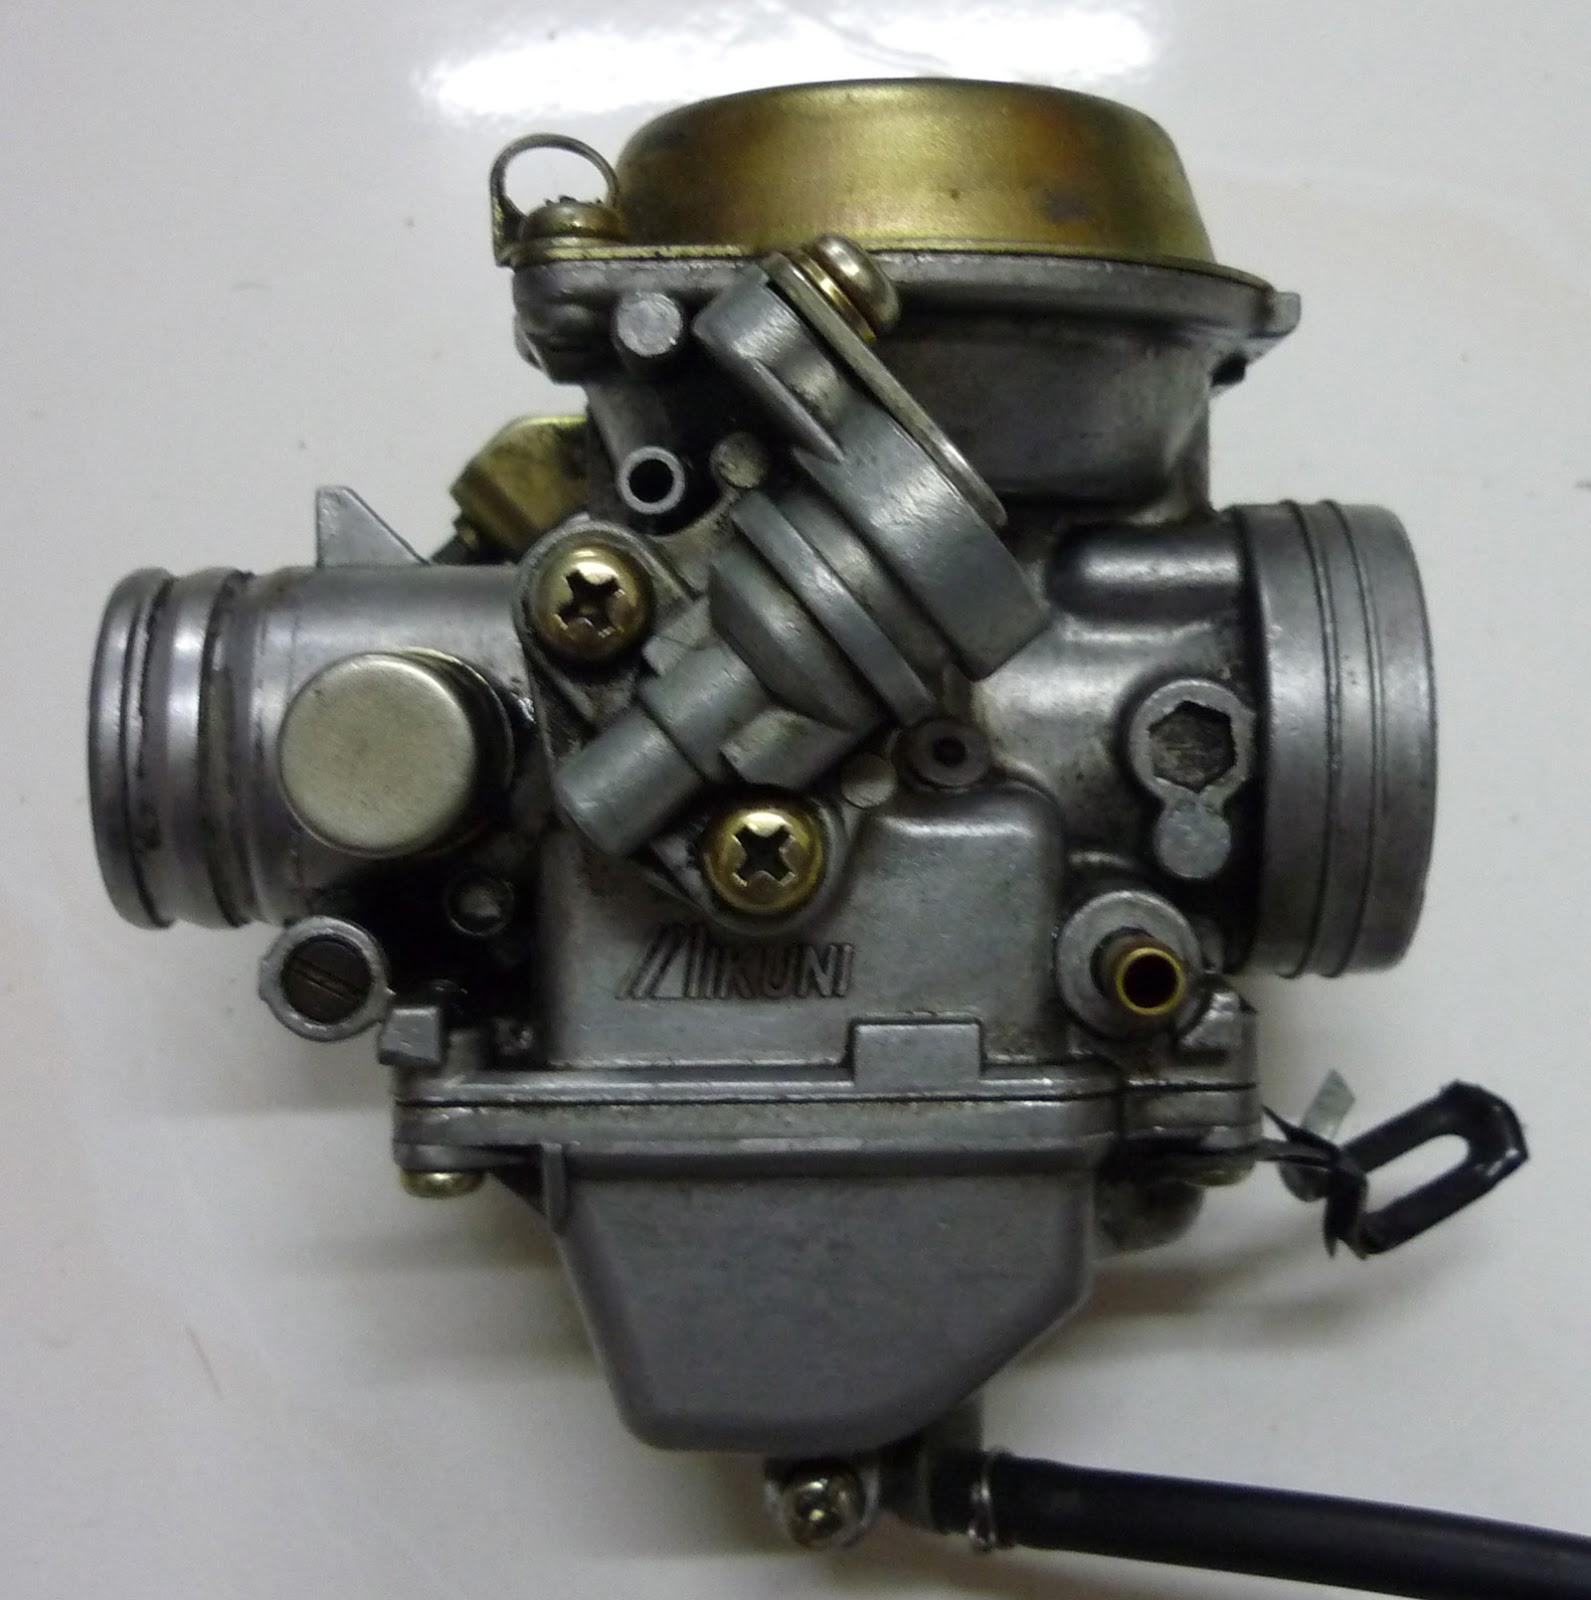 mikuni carburetor 30mm 150cc gy6 scooter rc. Black Bedroom Furniture Sets. Home Design Ideas